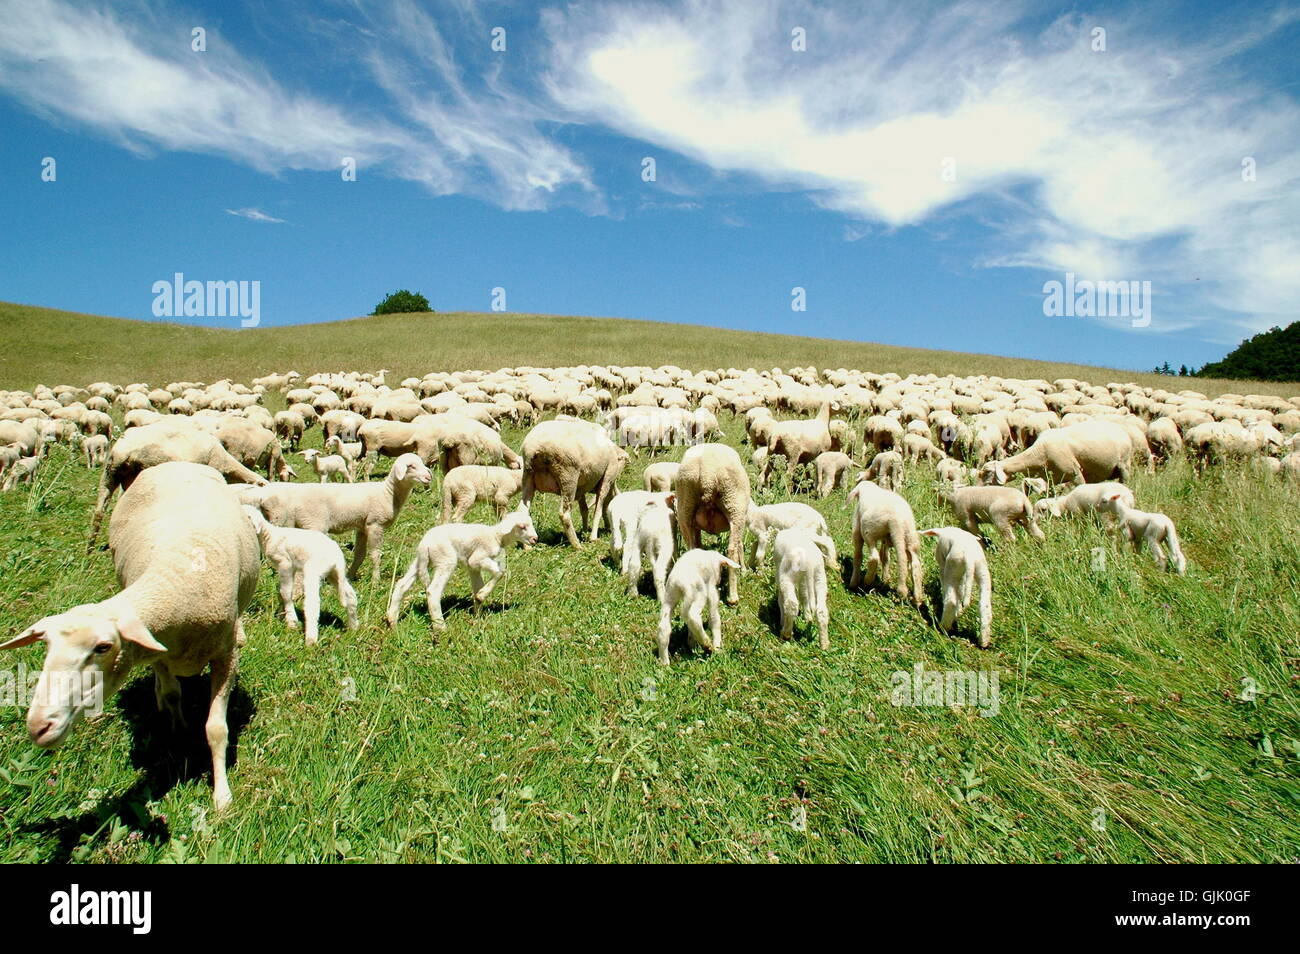 flock of sheep sheep (pl.) firmament - Stock Image